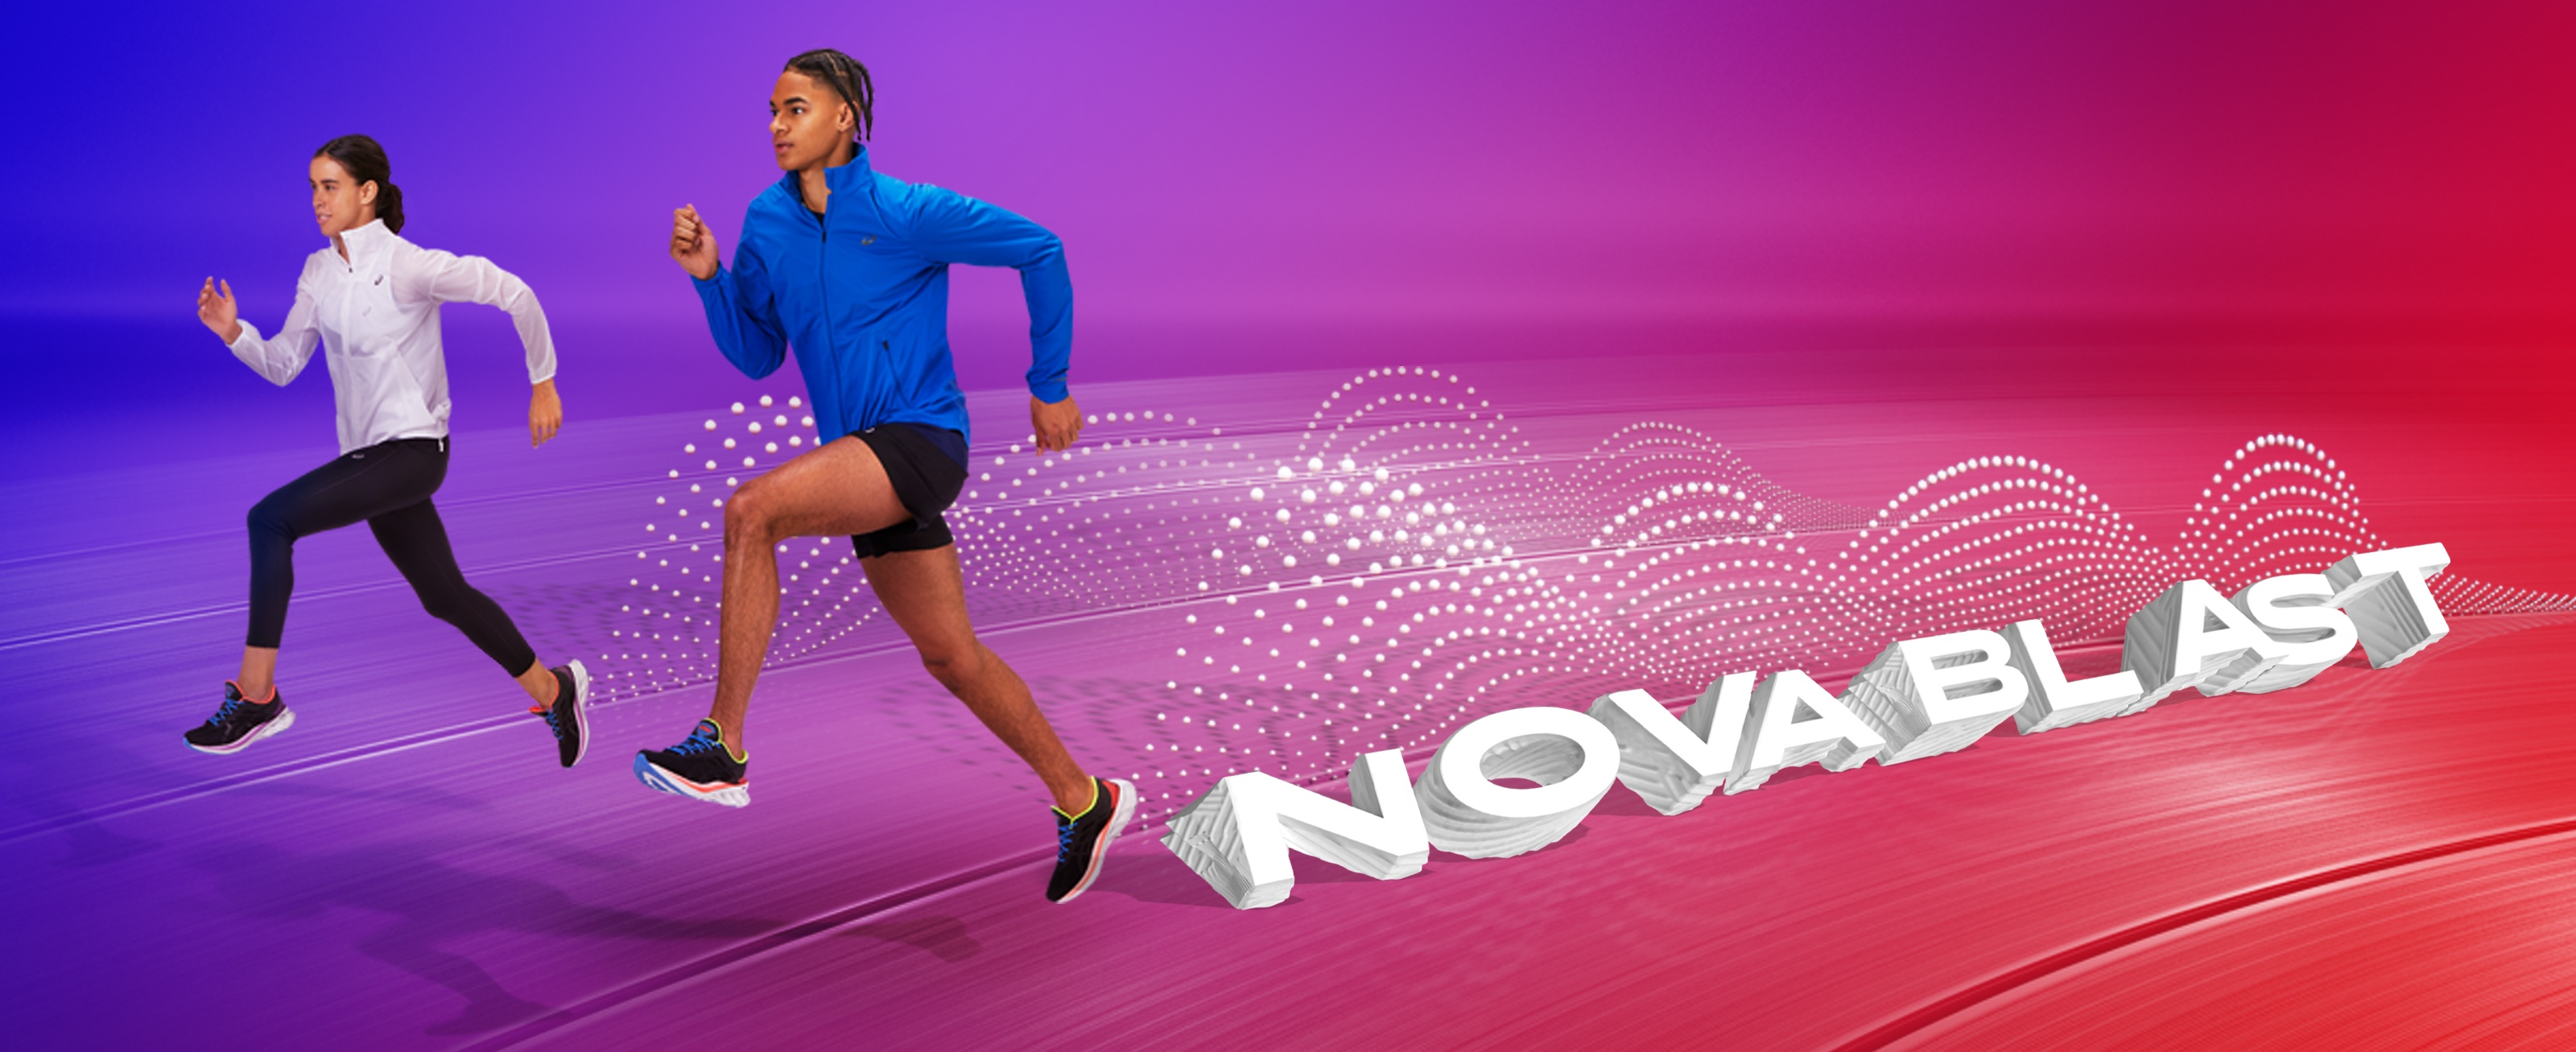 Man and woman running in Novablast running shoes. Novablast?